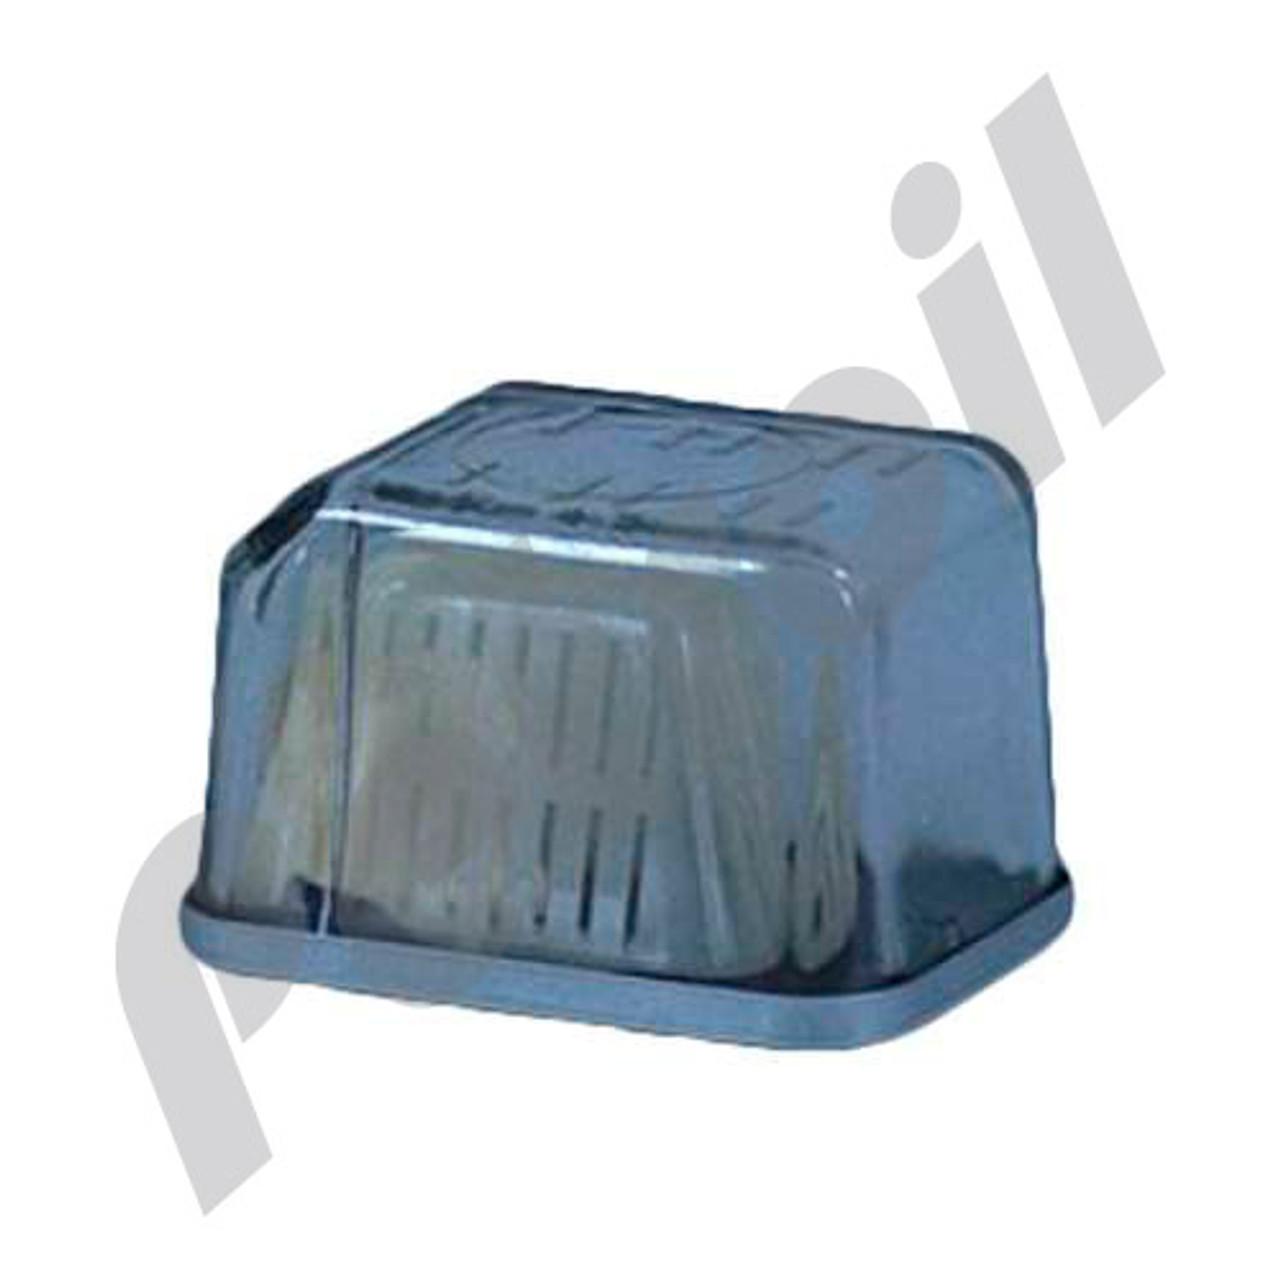 c 12 cat fuel filter hosing [ 1280 x 1280 Pixel ]